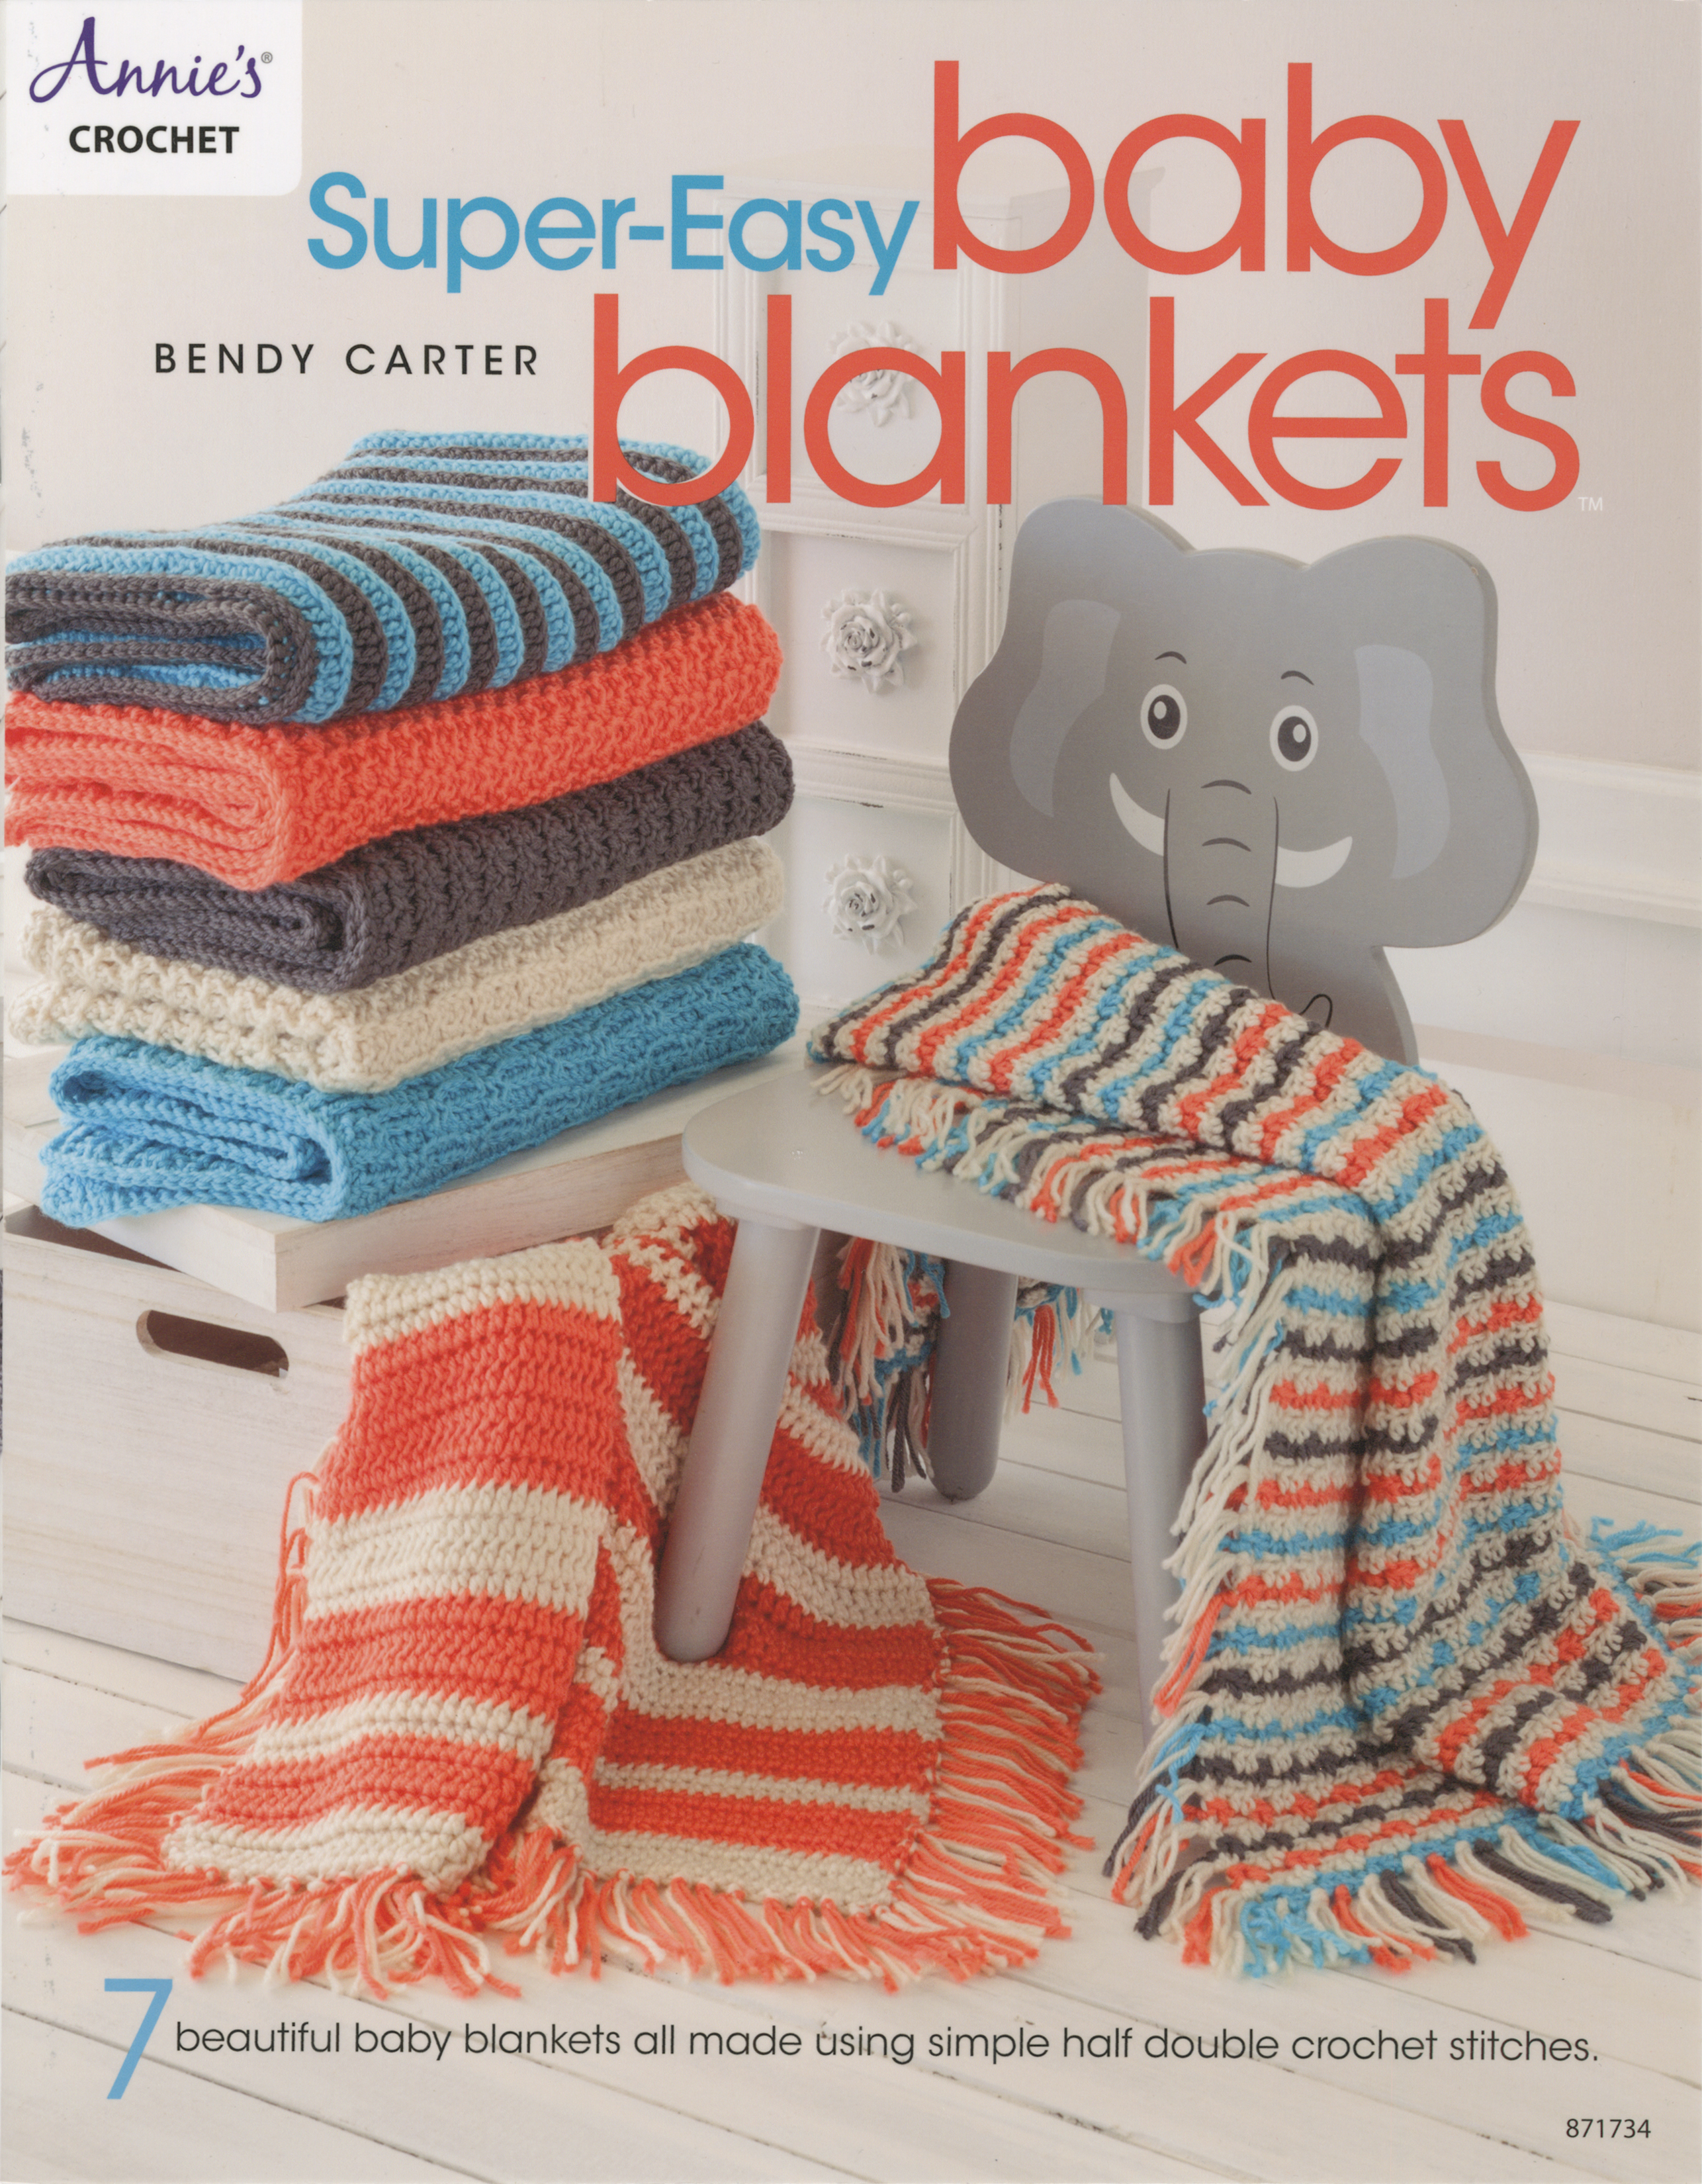 Annie's Books-Super-Easy Baby Blankets